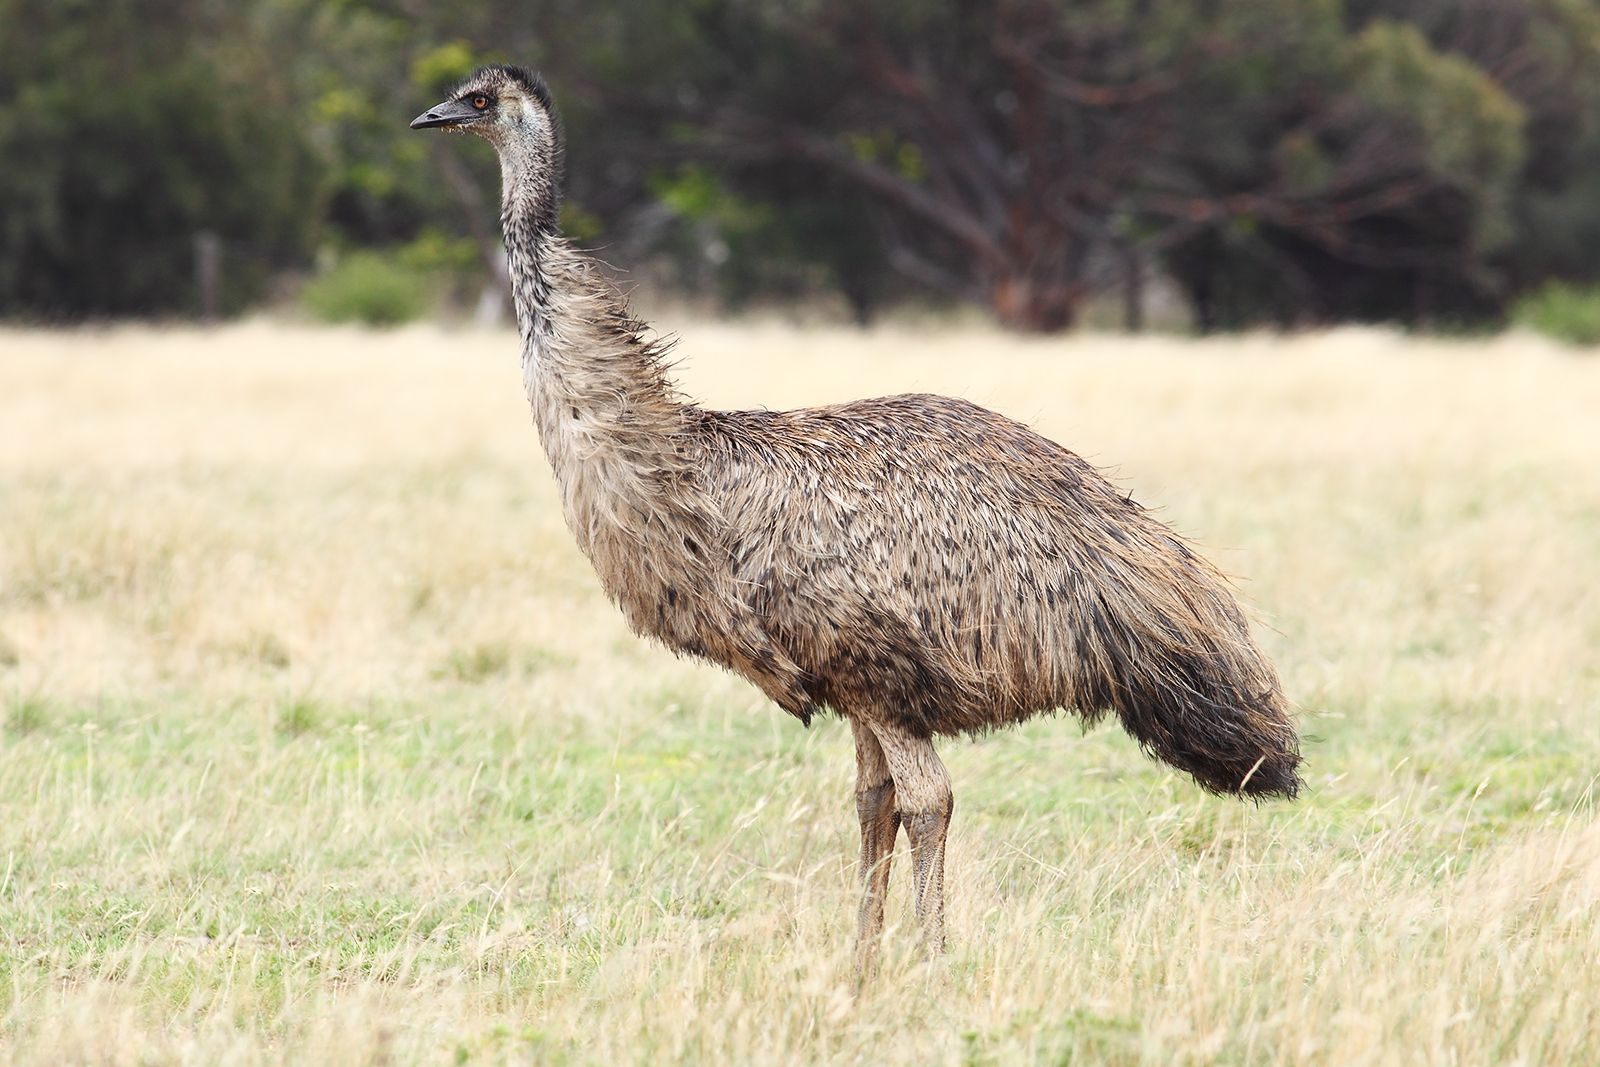 Emu Mobili ~ Tall and majestic the emu belongs to a group of flightless